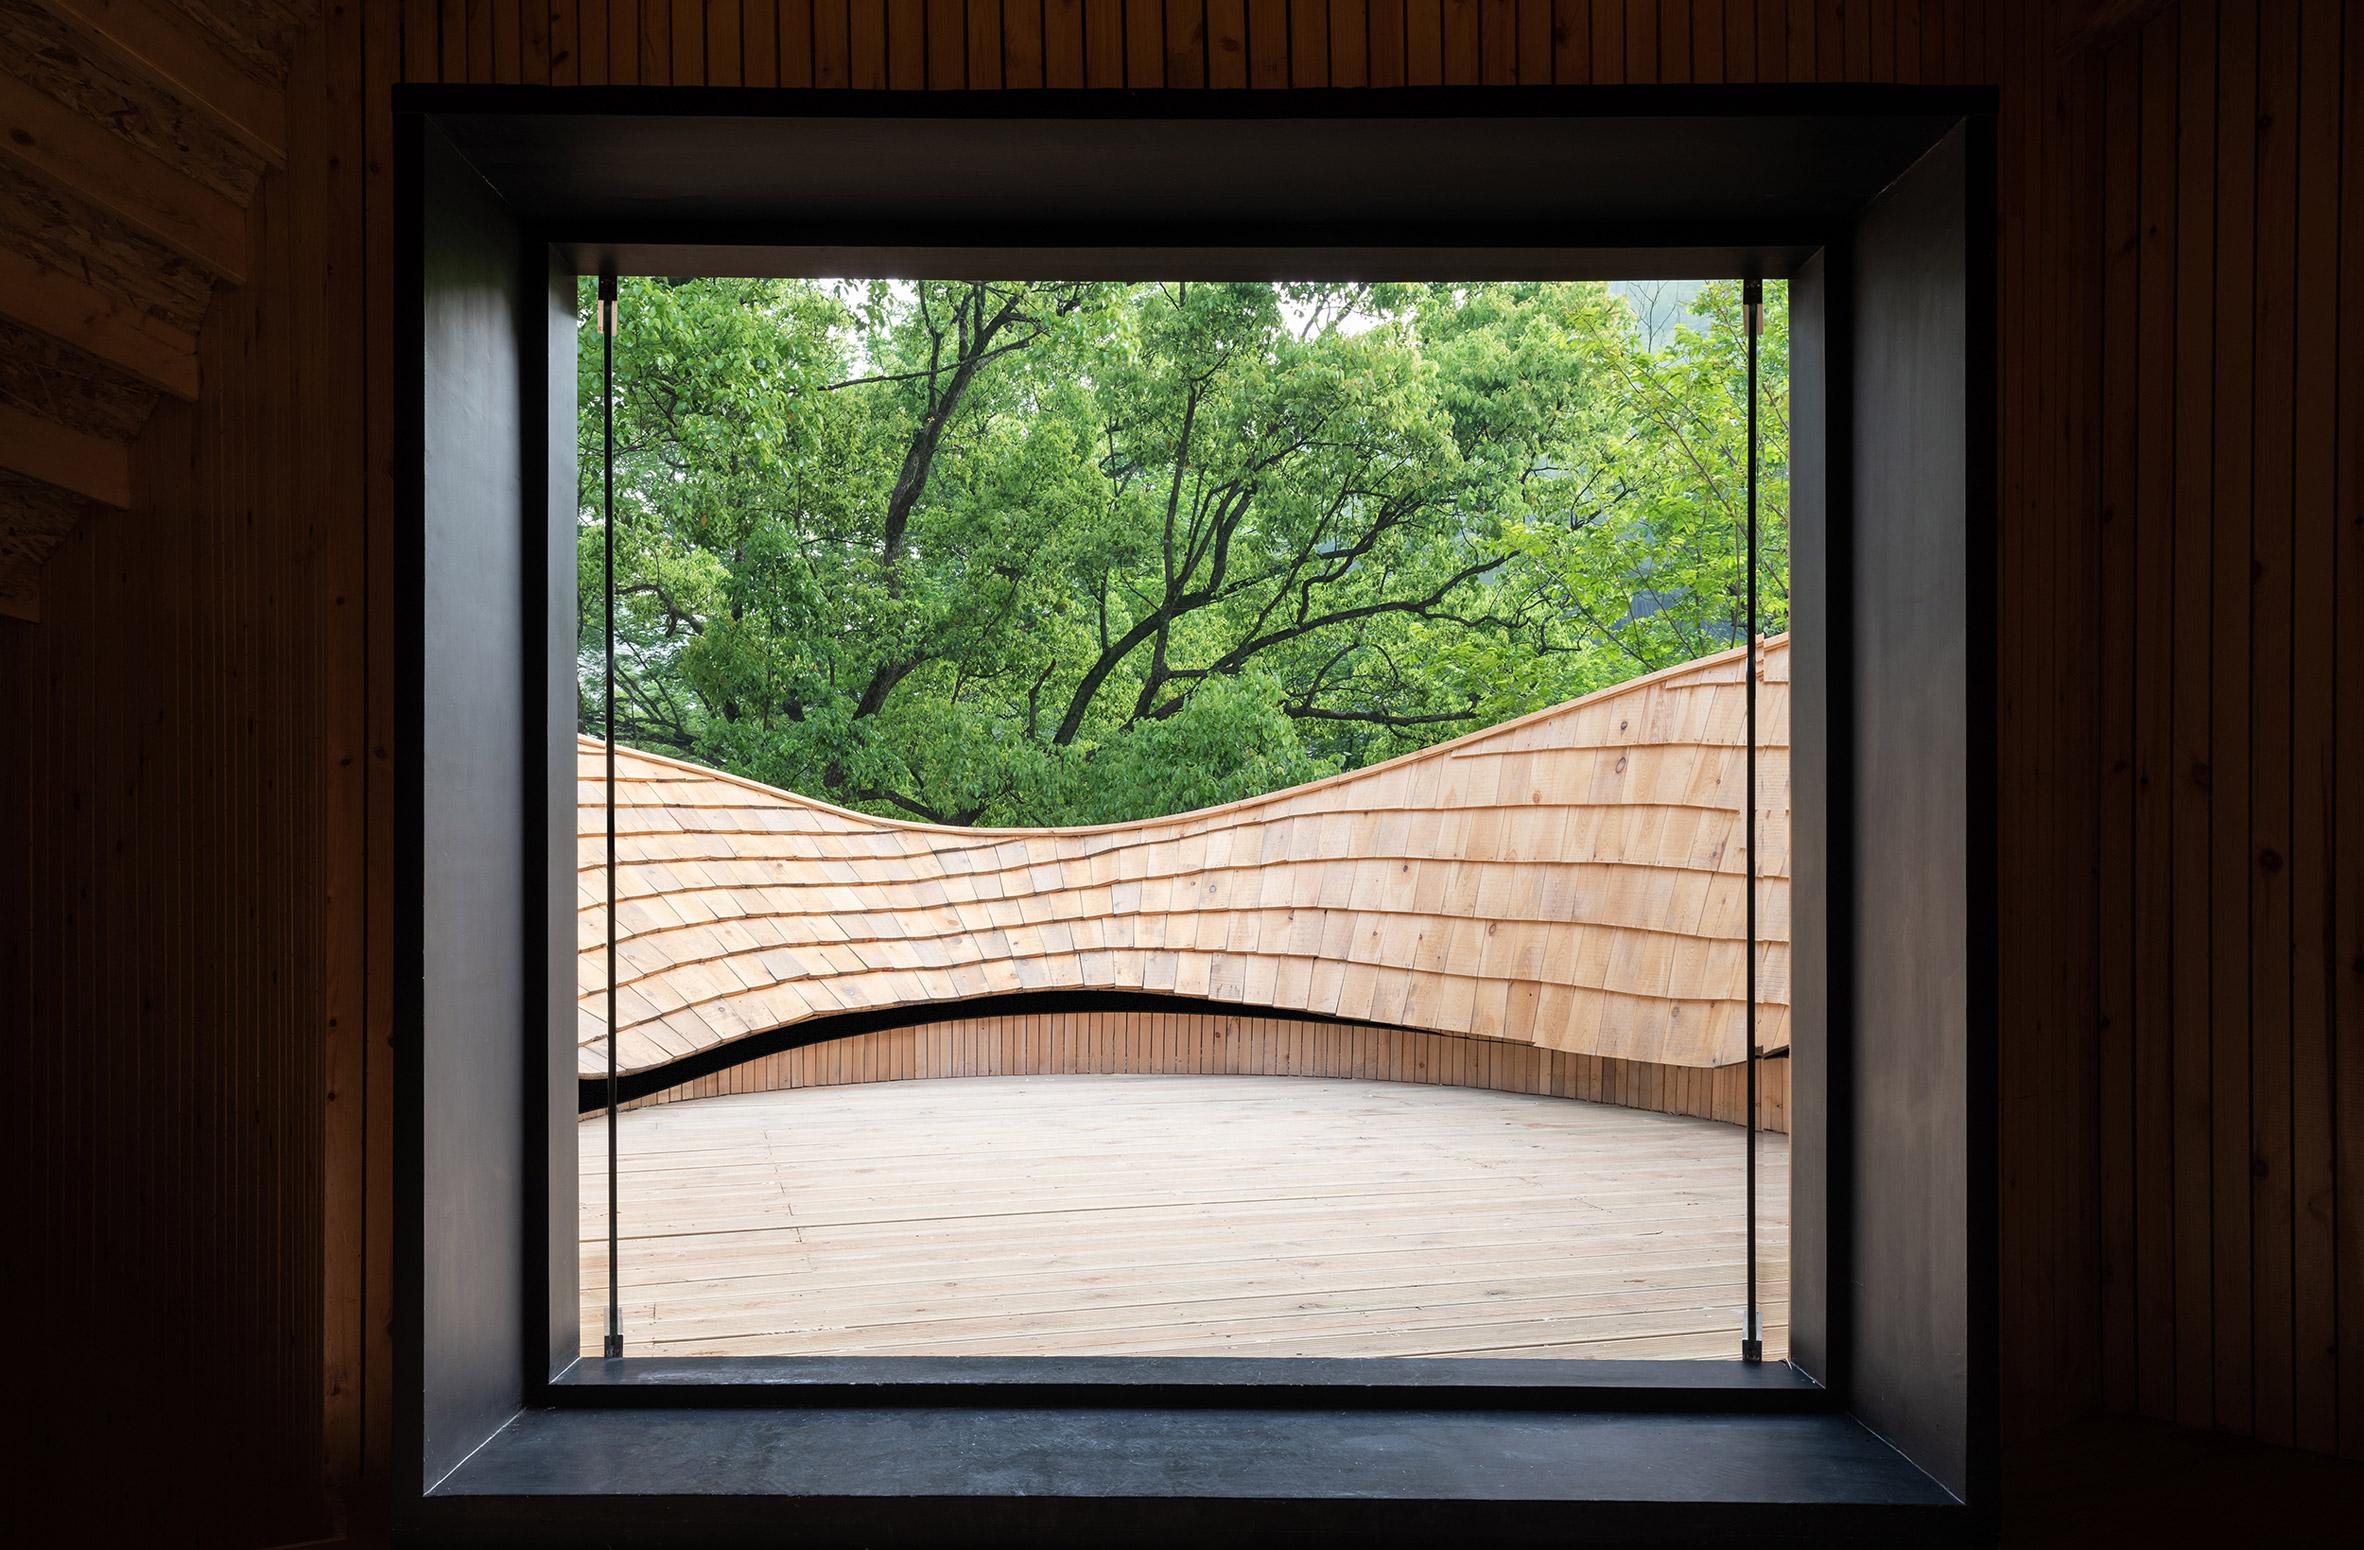 nơi nghỉ dưỡng treewow-treehouse-monoarchi-architecture-xband-club-zhongcun-5